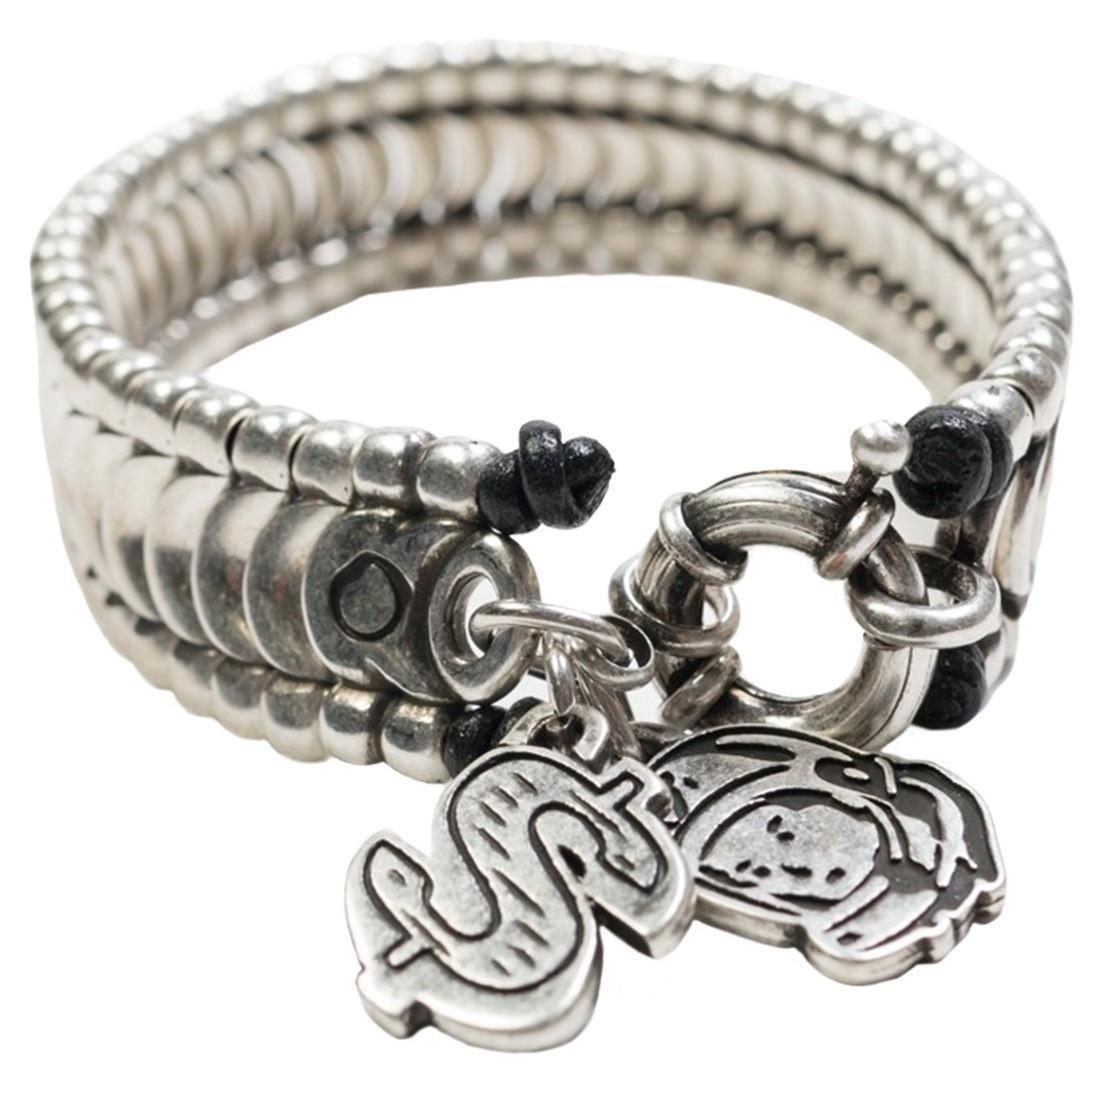 Billionaire Boys Club Eclipse Bracelet (silver)